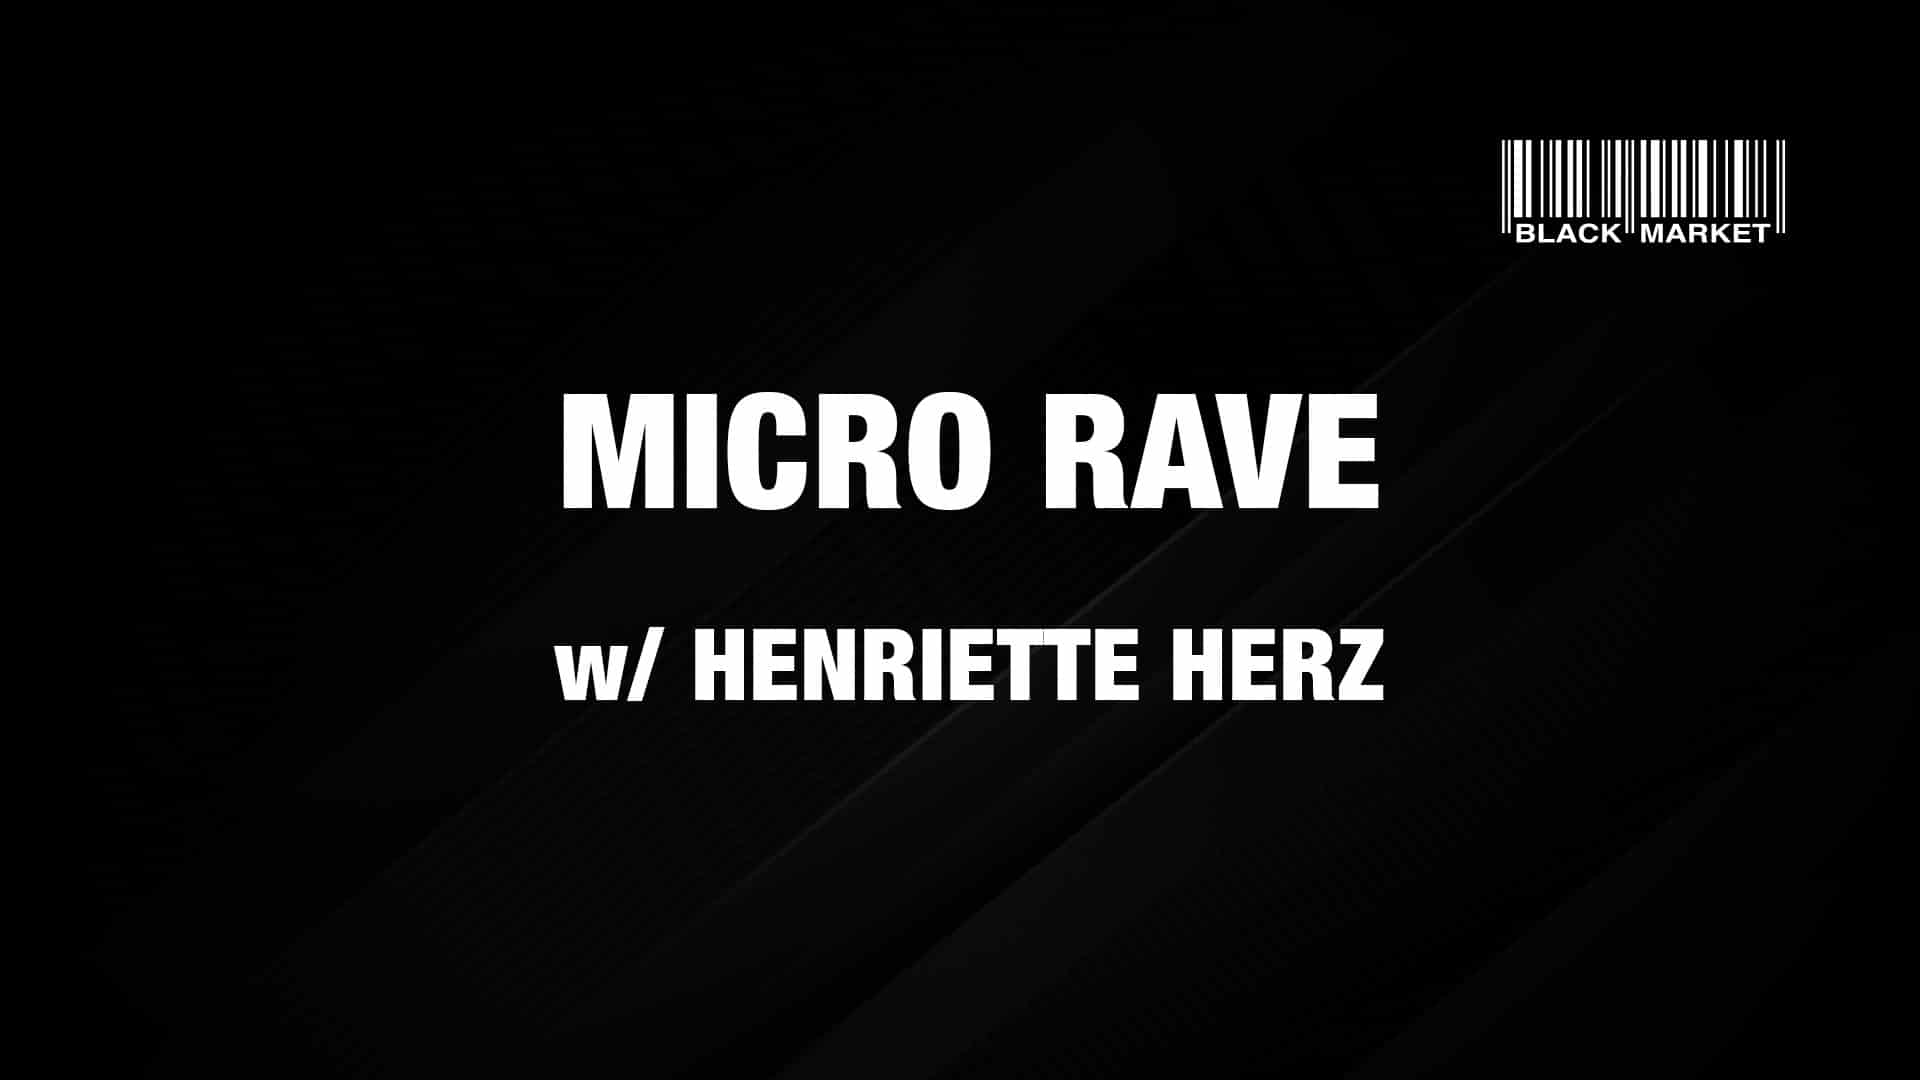 Events Wien: MICRO RAVE #5 w/ HENRIETTE HERZ